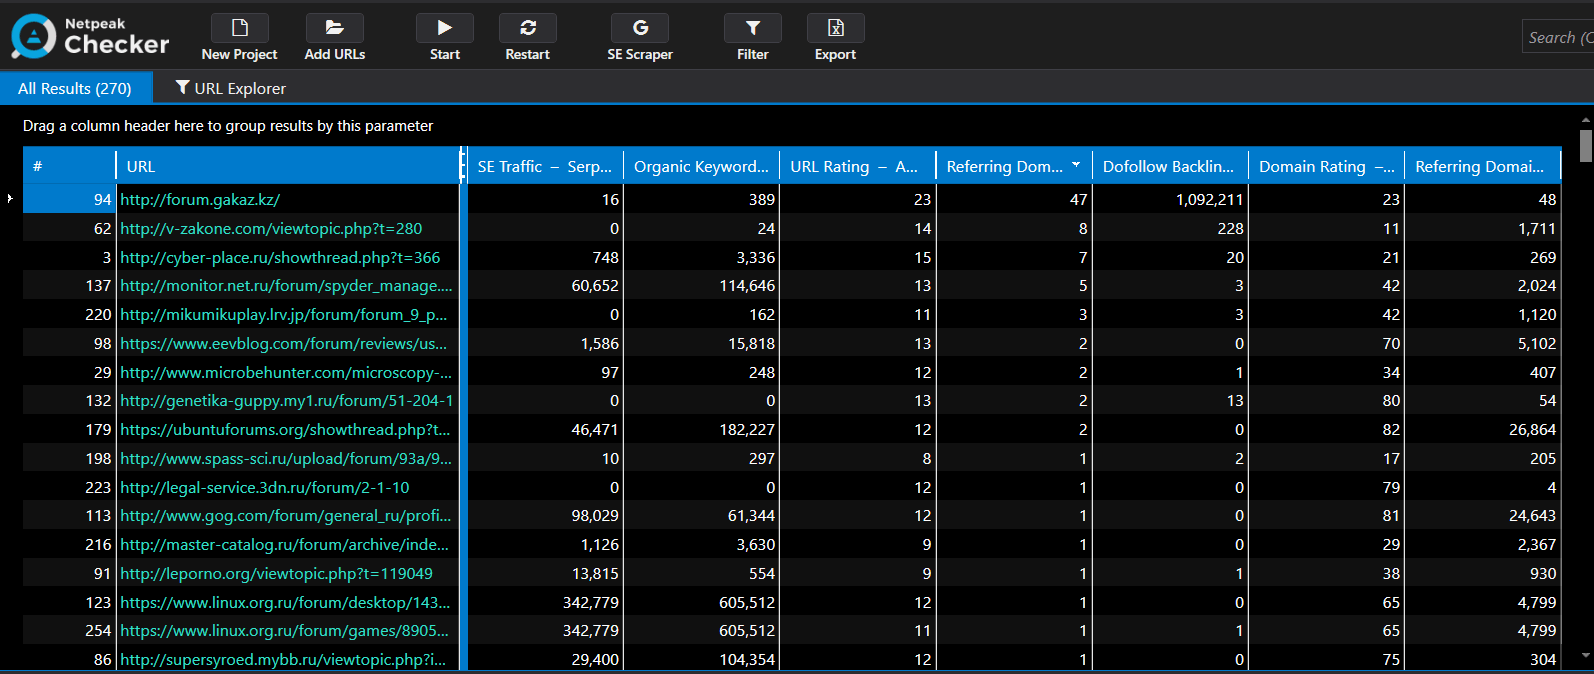 Analyzing results in Netpeak Checker